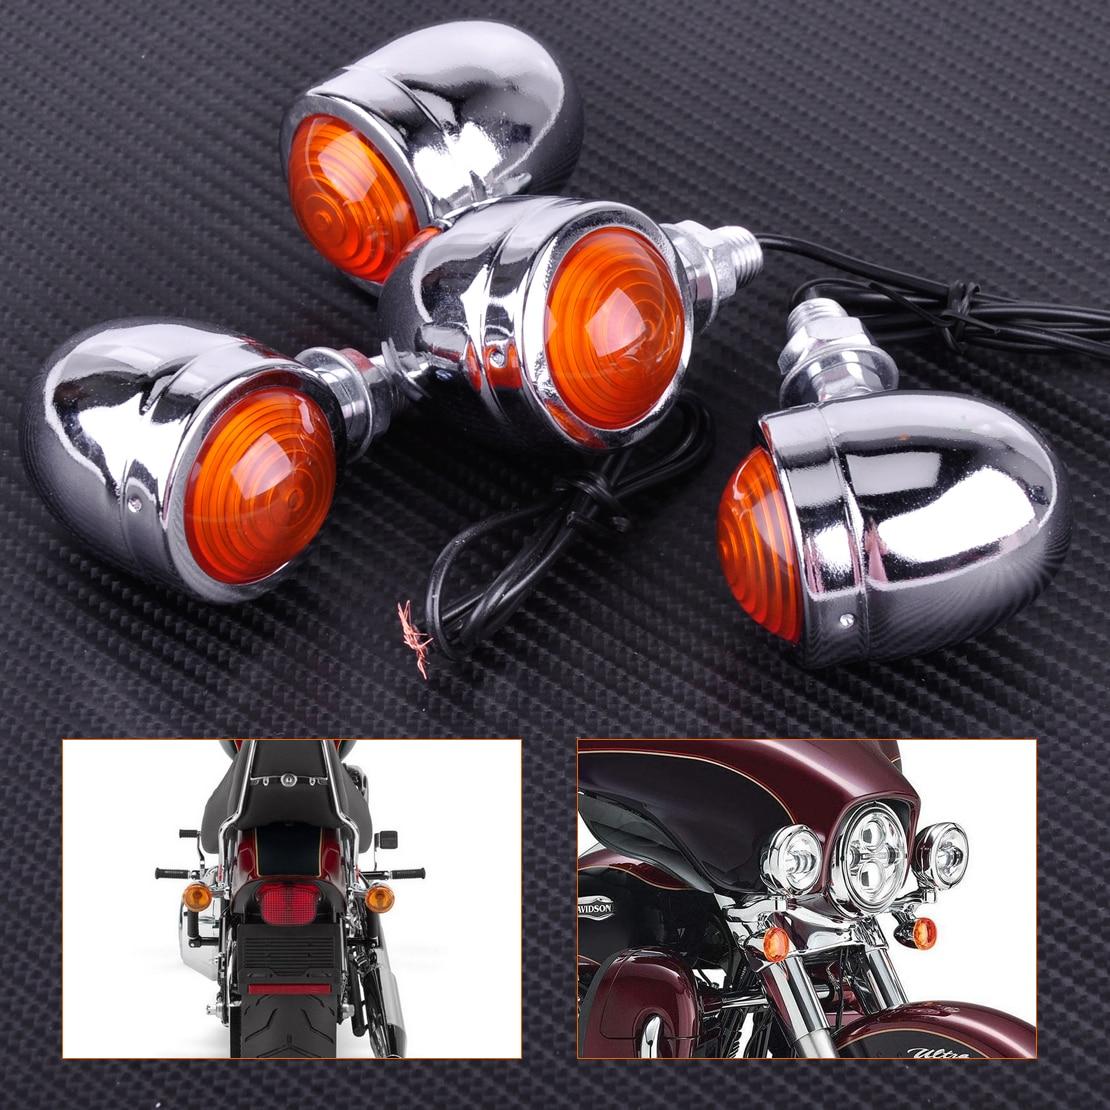 CITALL Motorcycle 4x Silver Chrome Plate Bullet Turn Signal Light Indicator font b Lamp b font